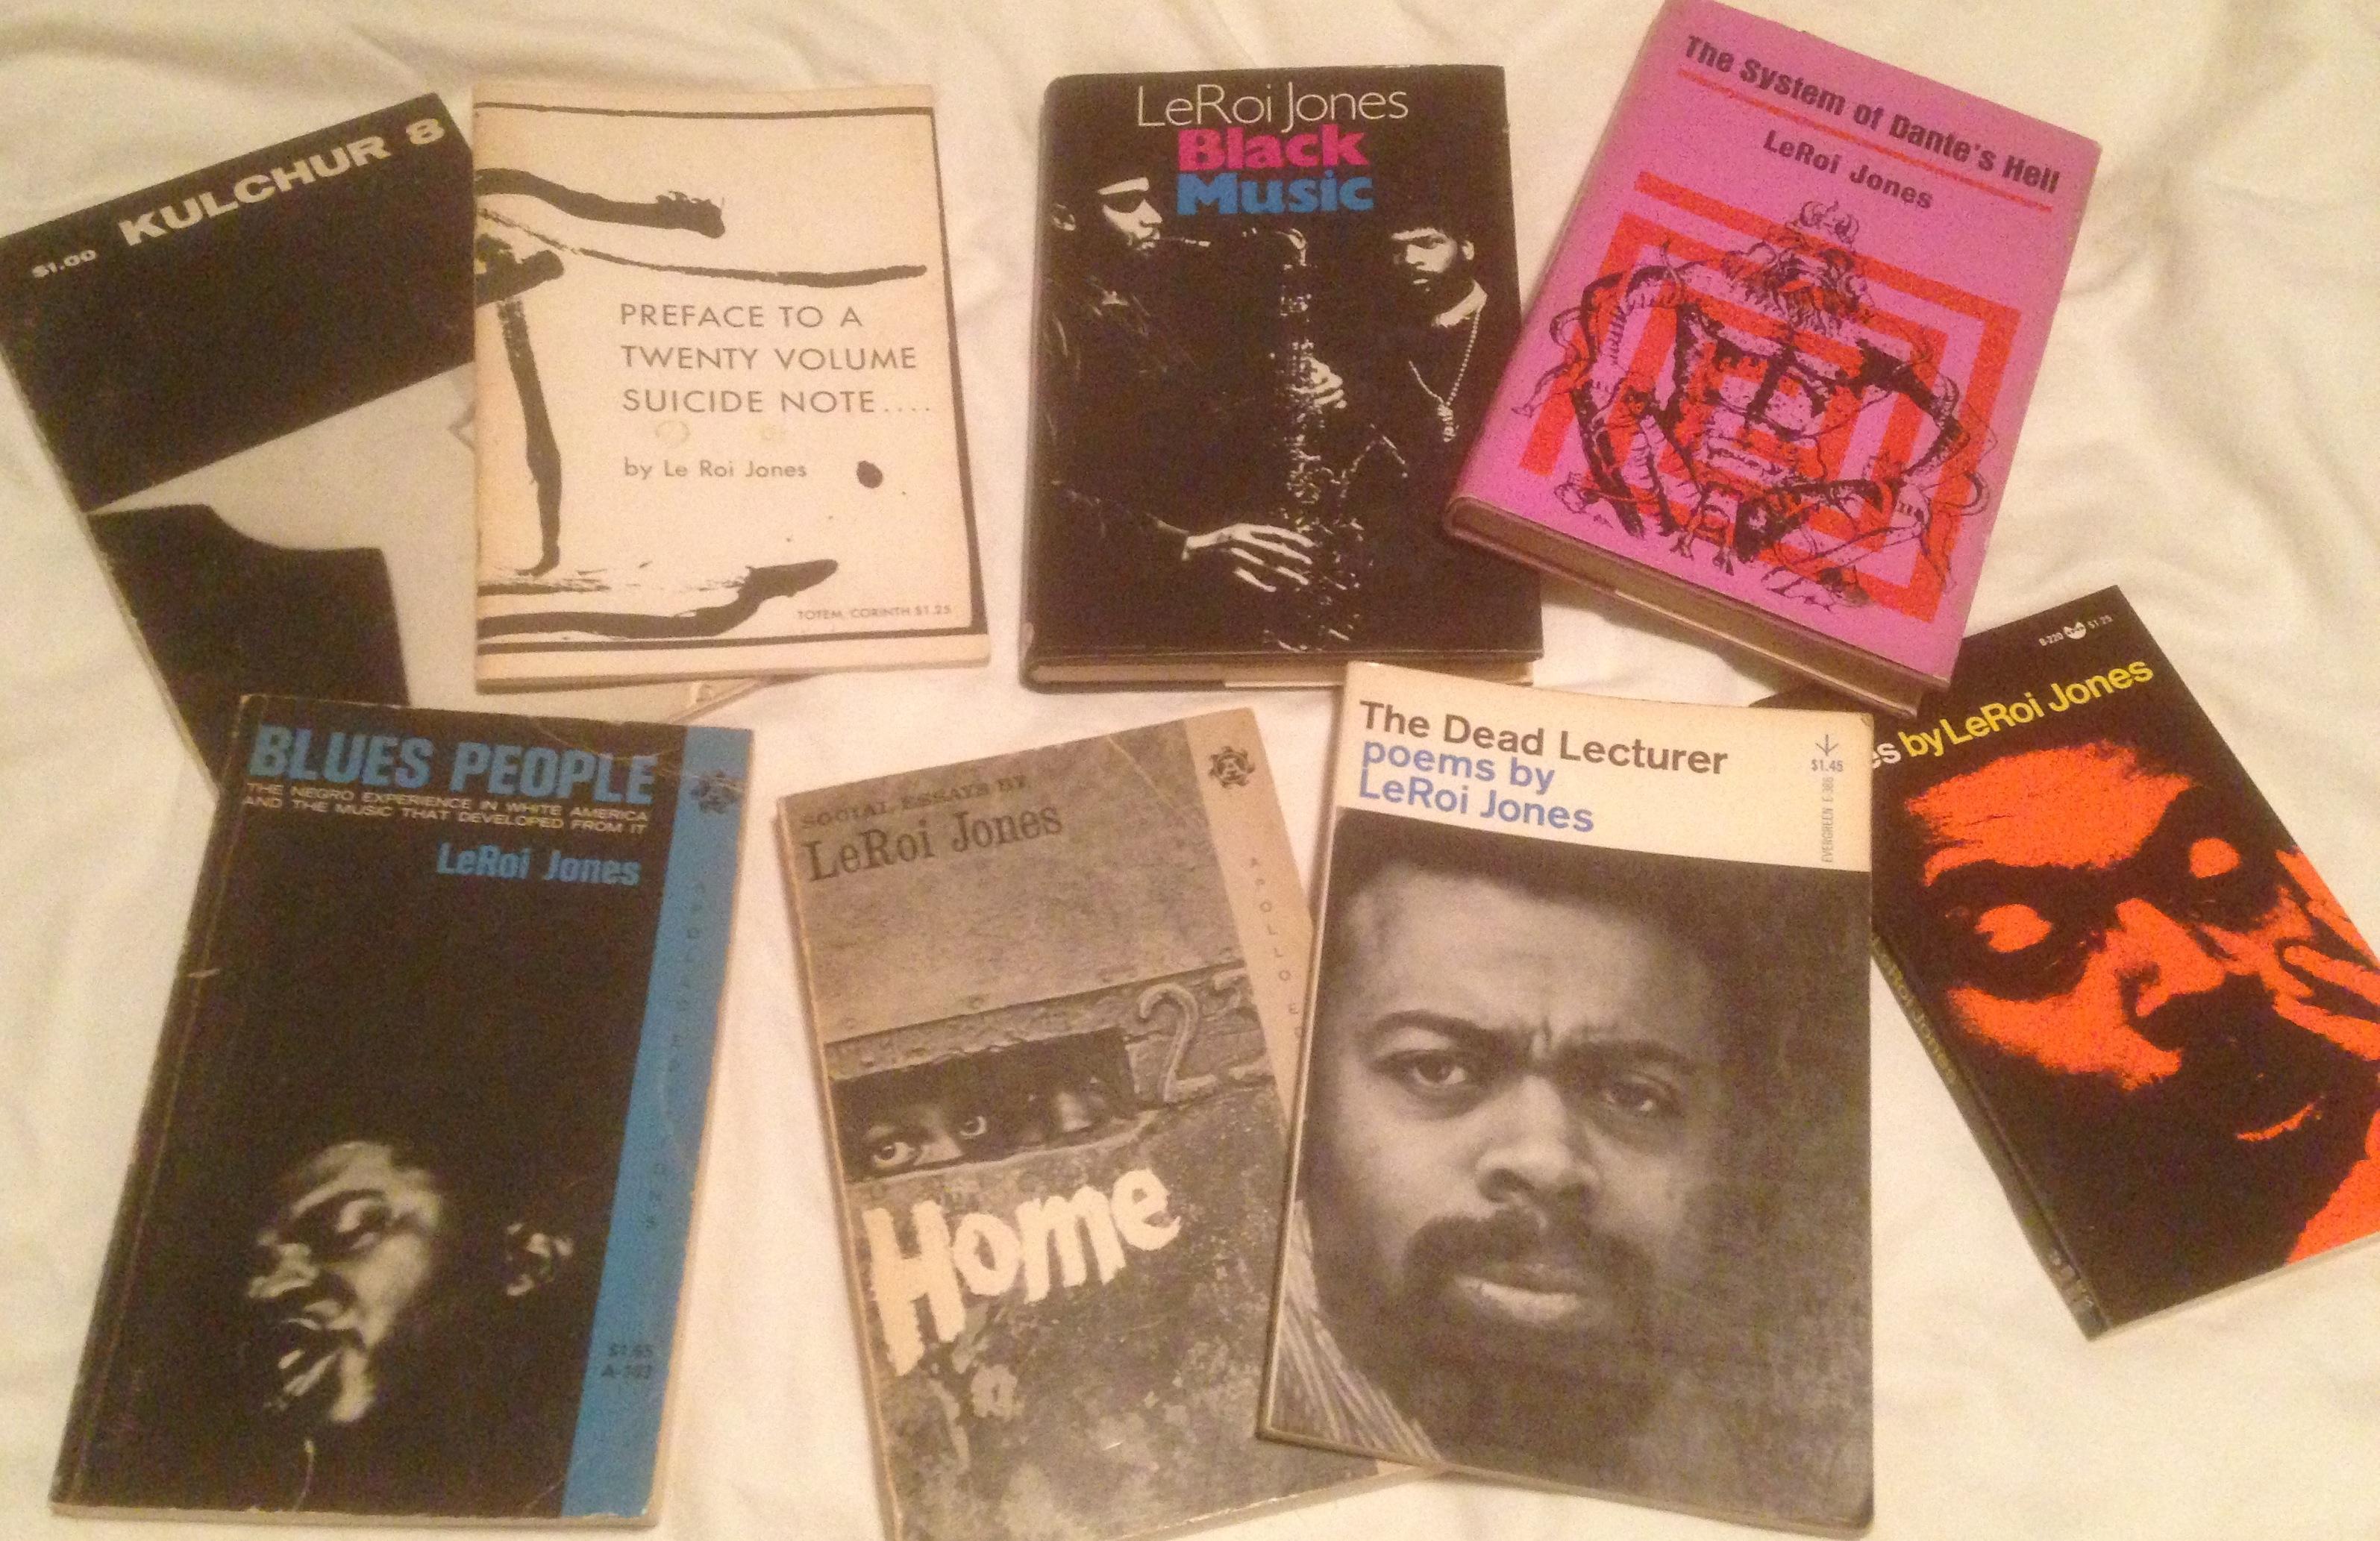 amiri baraka home social essays Home: social essays (1966) black magic (1969) in our terribleness (1970) selected essays of amiri baraka/leroi jones.